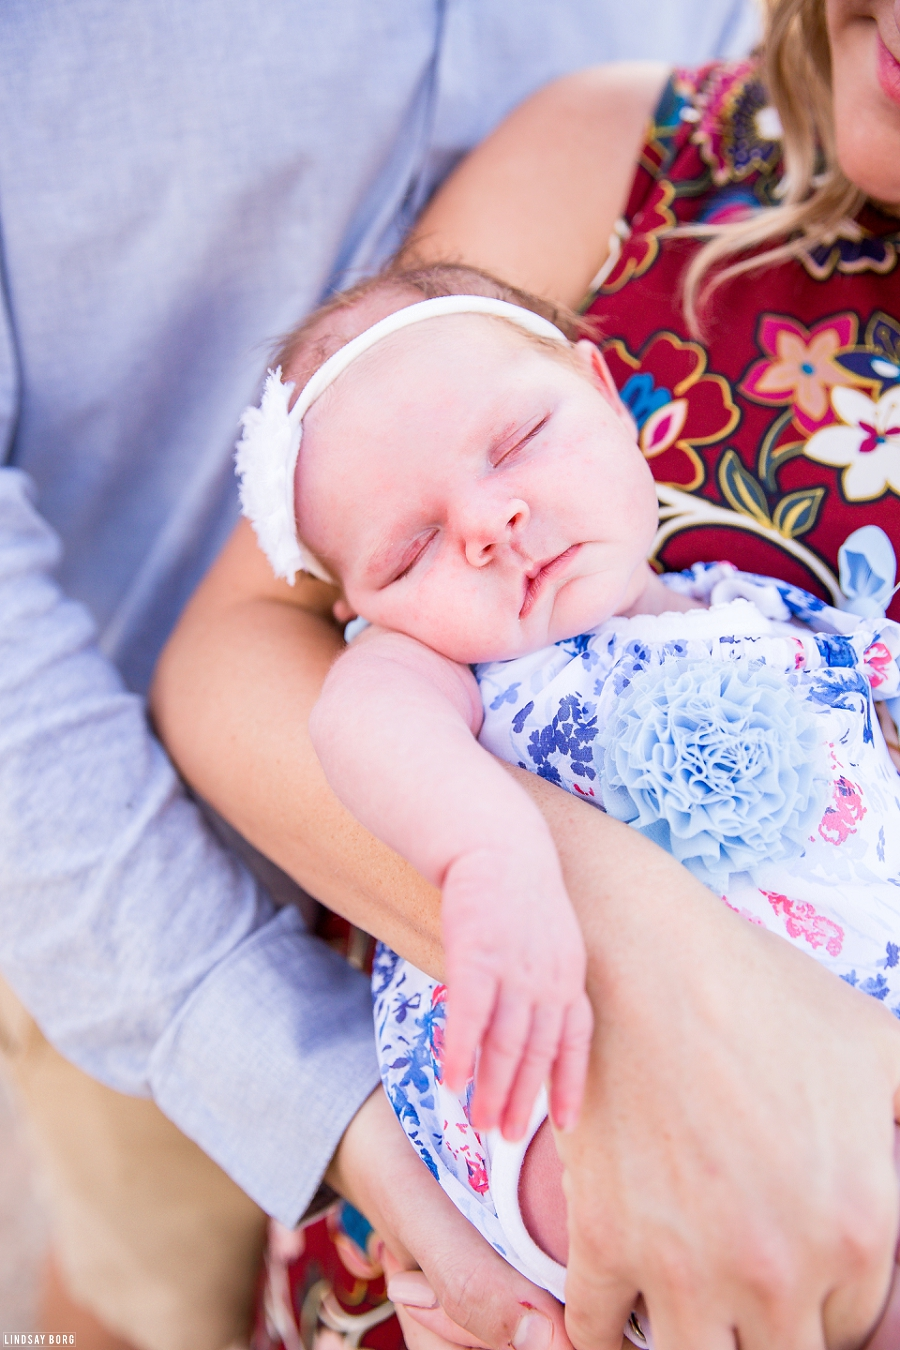 Lindsay-Borg-Photography-Arizona-family-photography (12).jpg